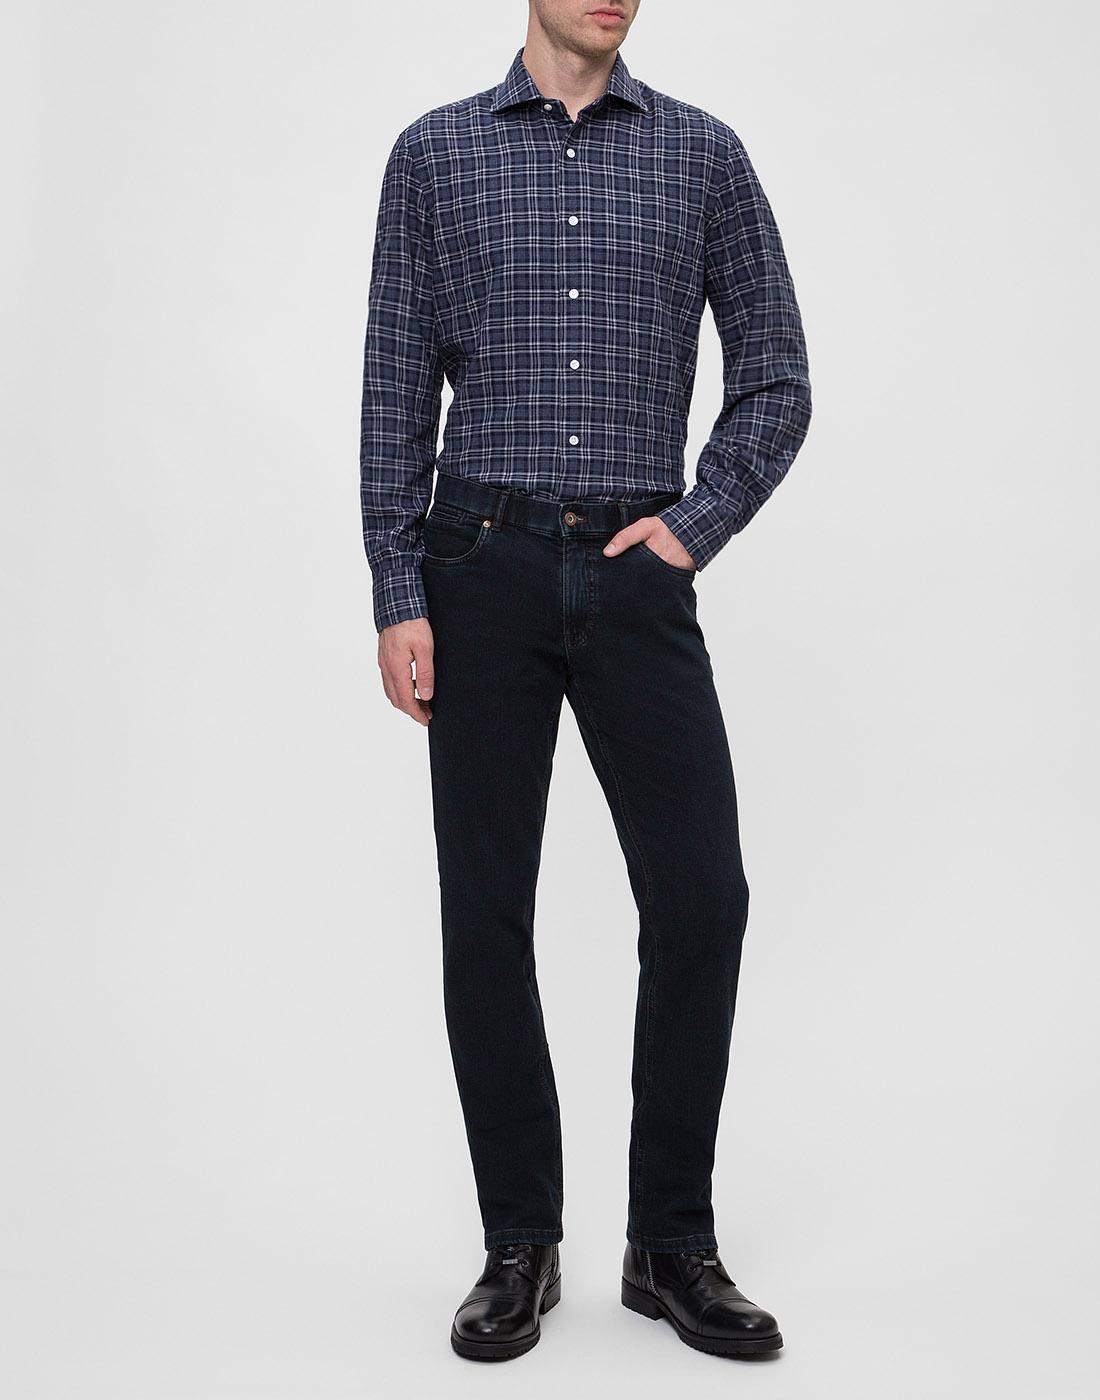 Мужская синяя рубашка в клетку Barba SD2U133603601X-5